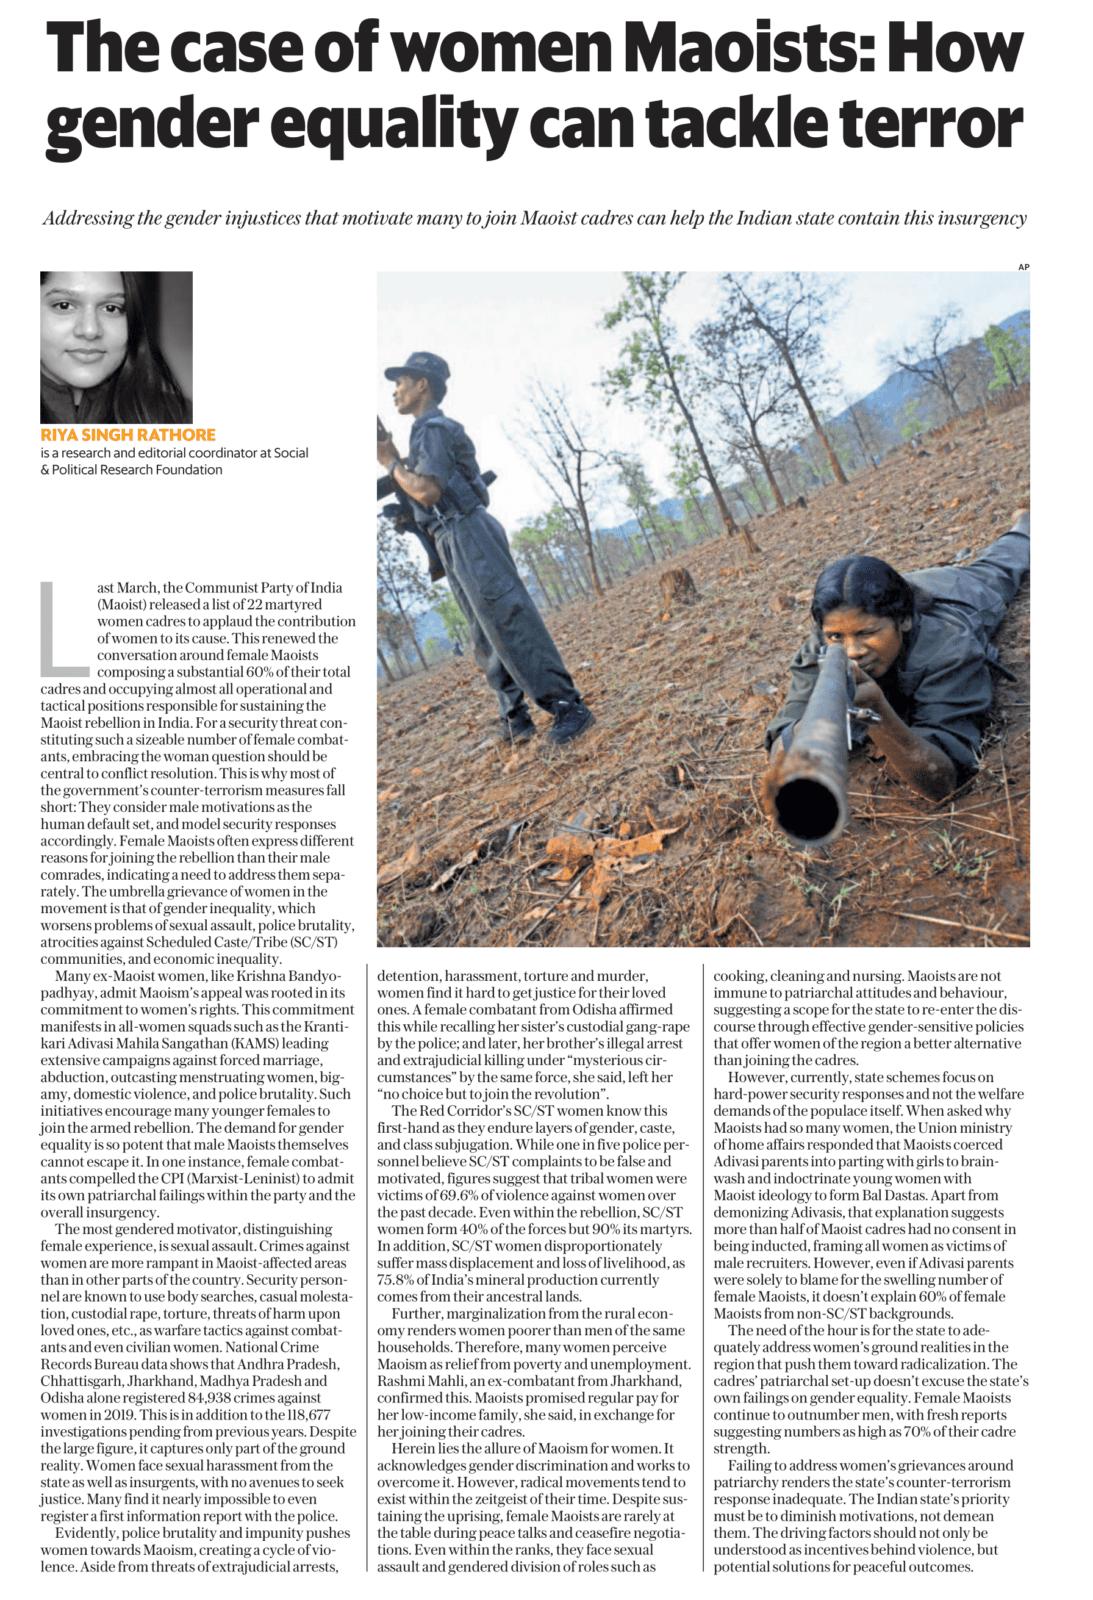 maoist women in india gender equality in anti terrorism